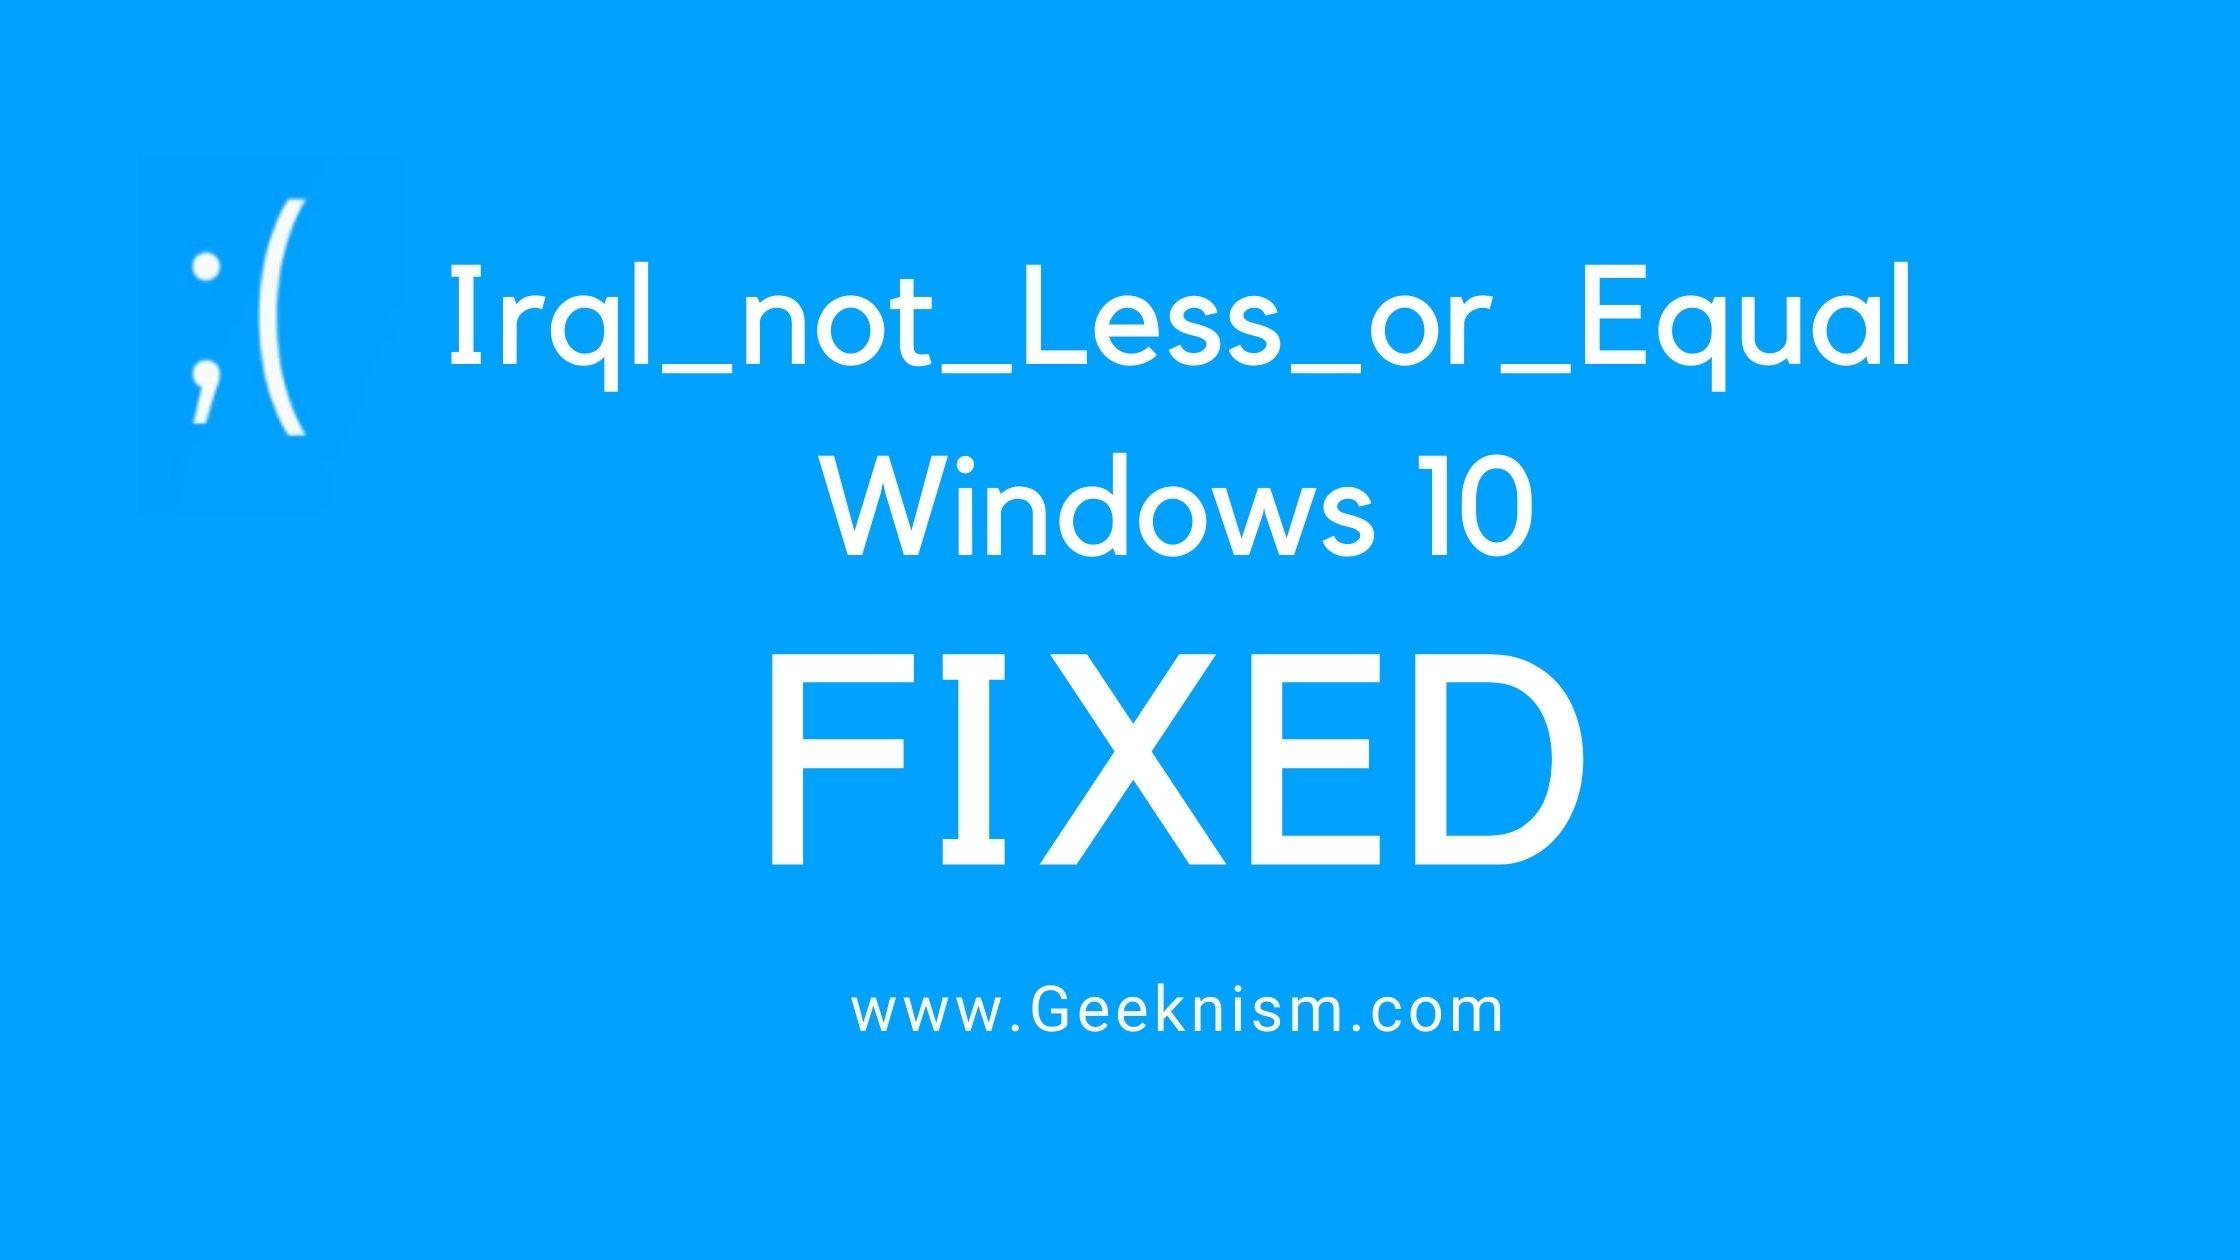 Irql_not_Less_or_Equal Windows 10